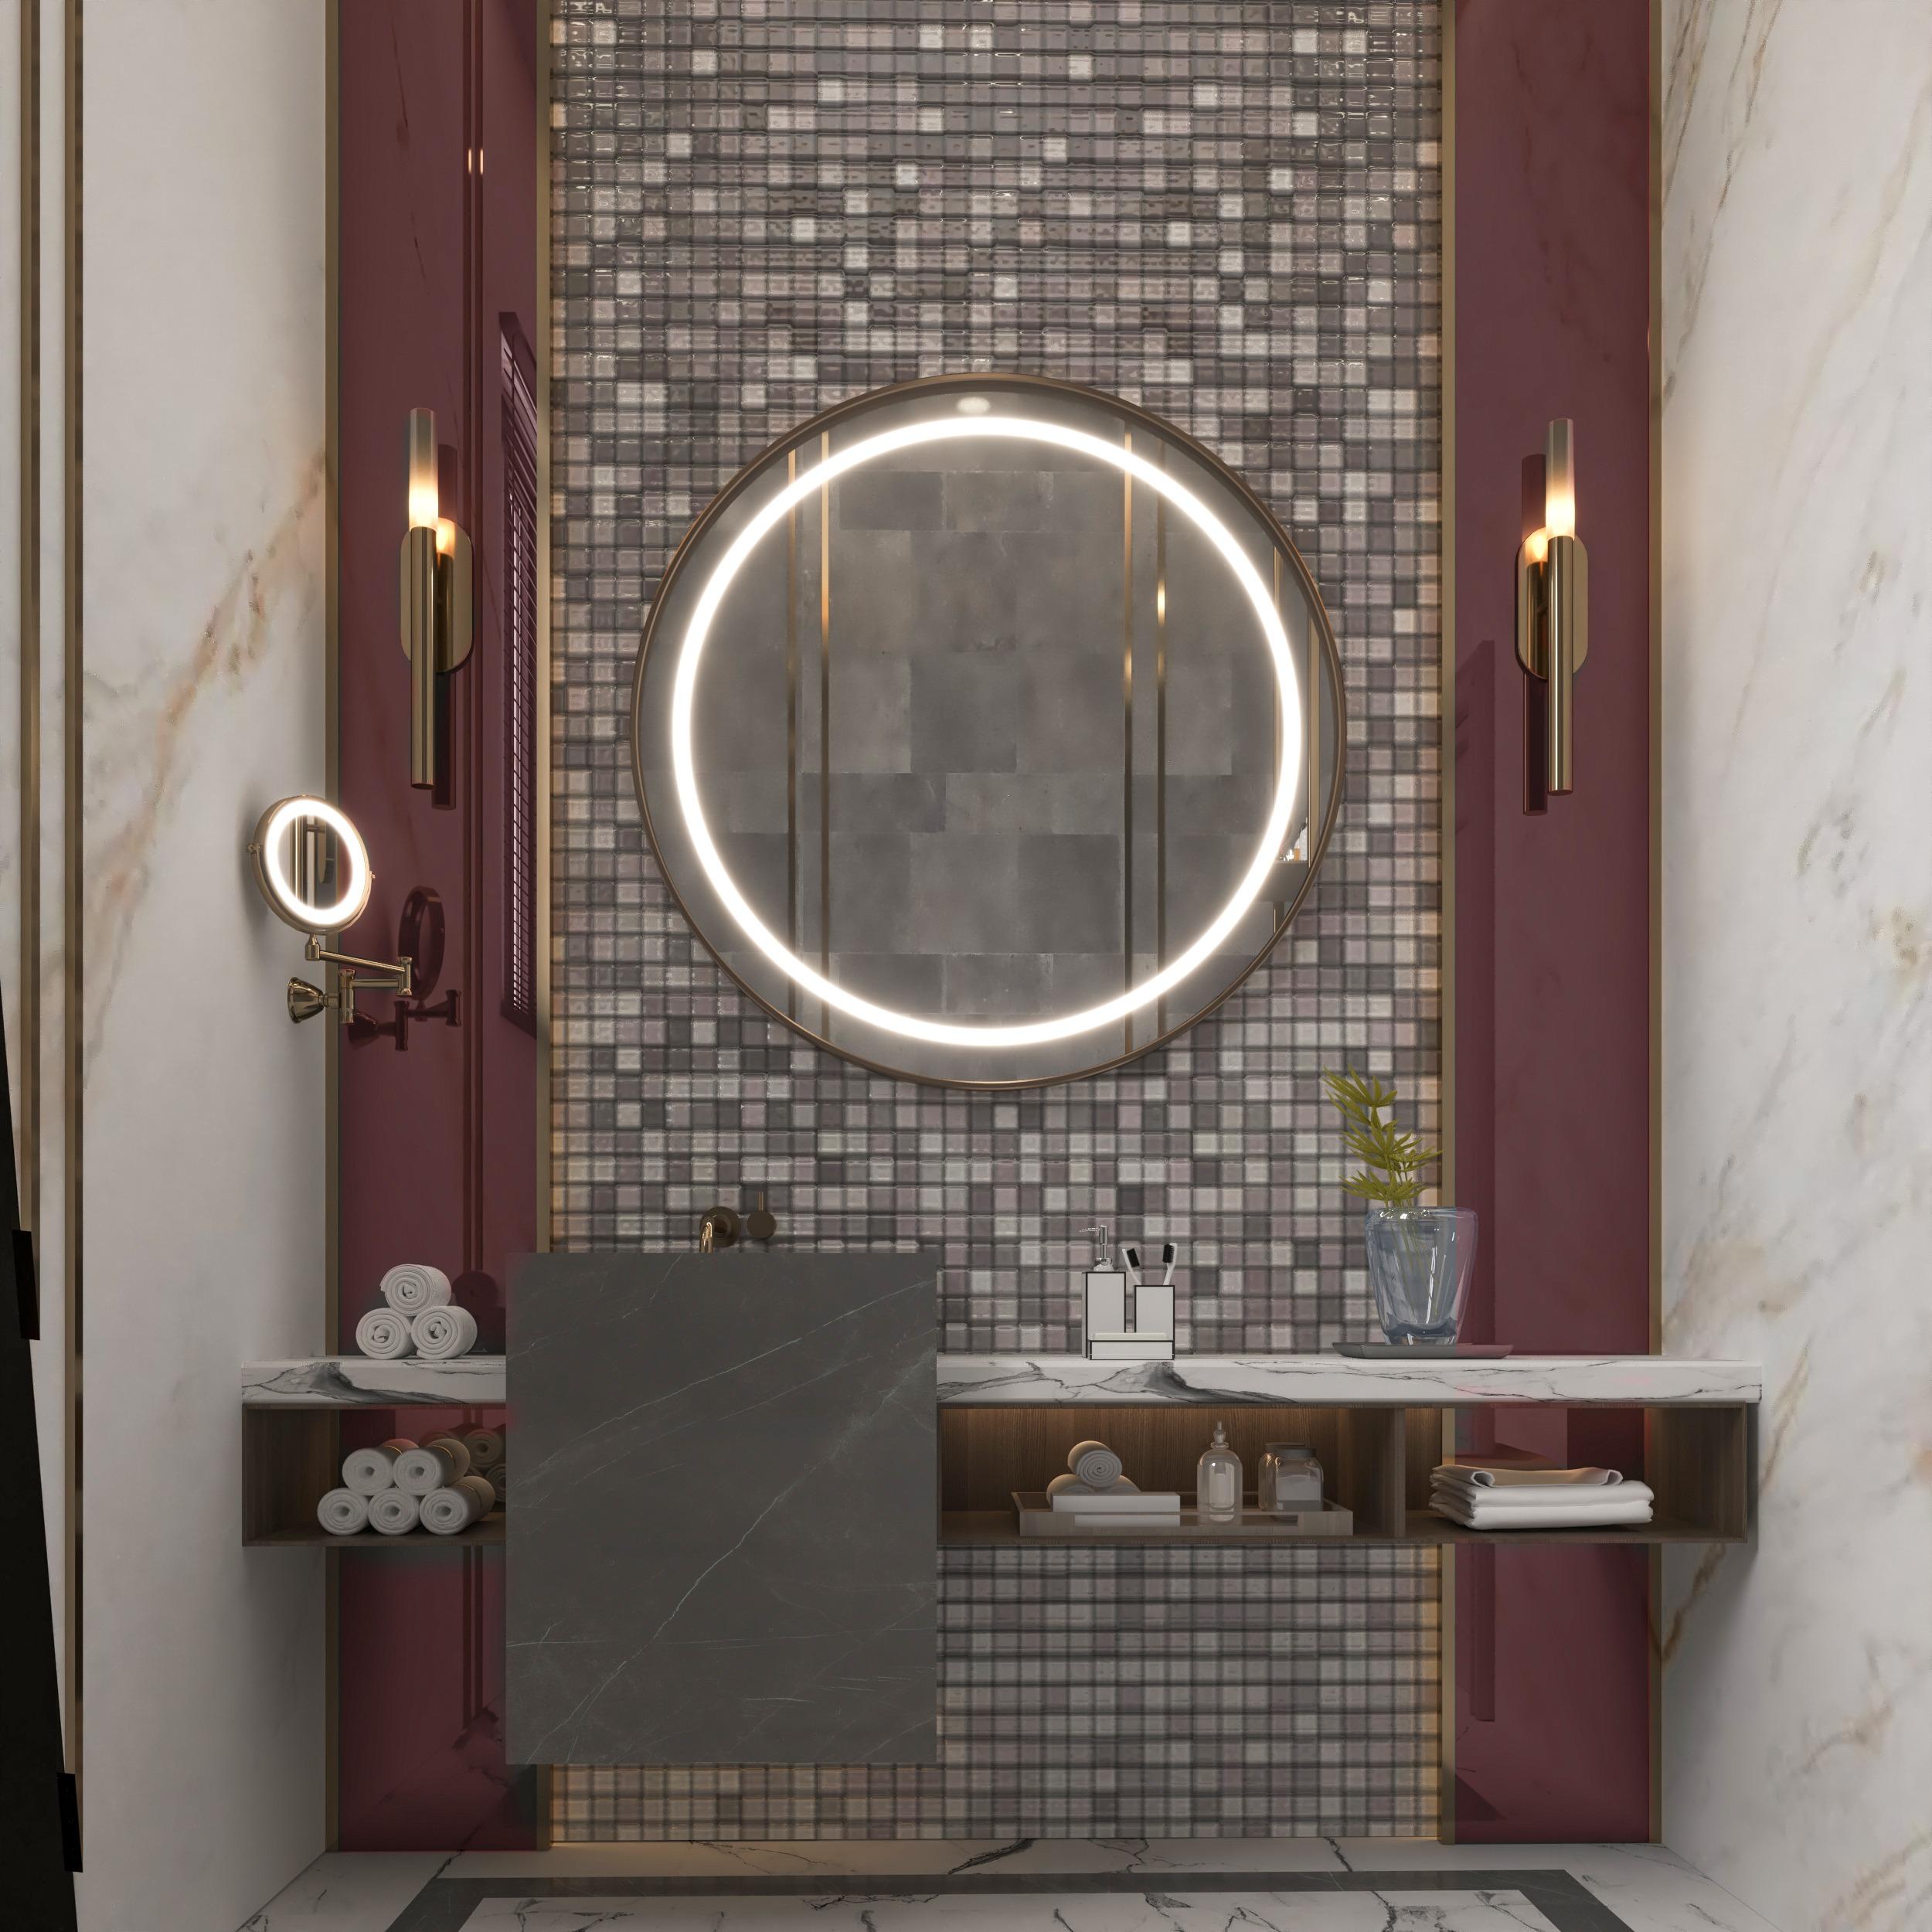 BATHROOM - DESIGN - CHERRY - WELL DESIGNED BATHROOMS